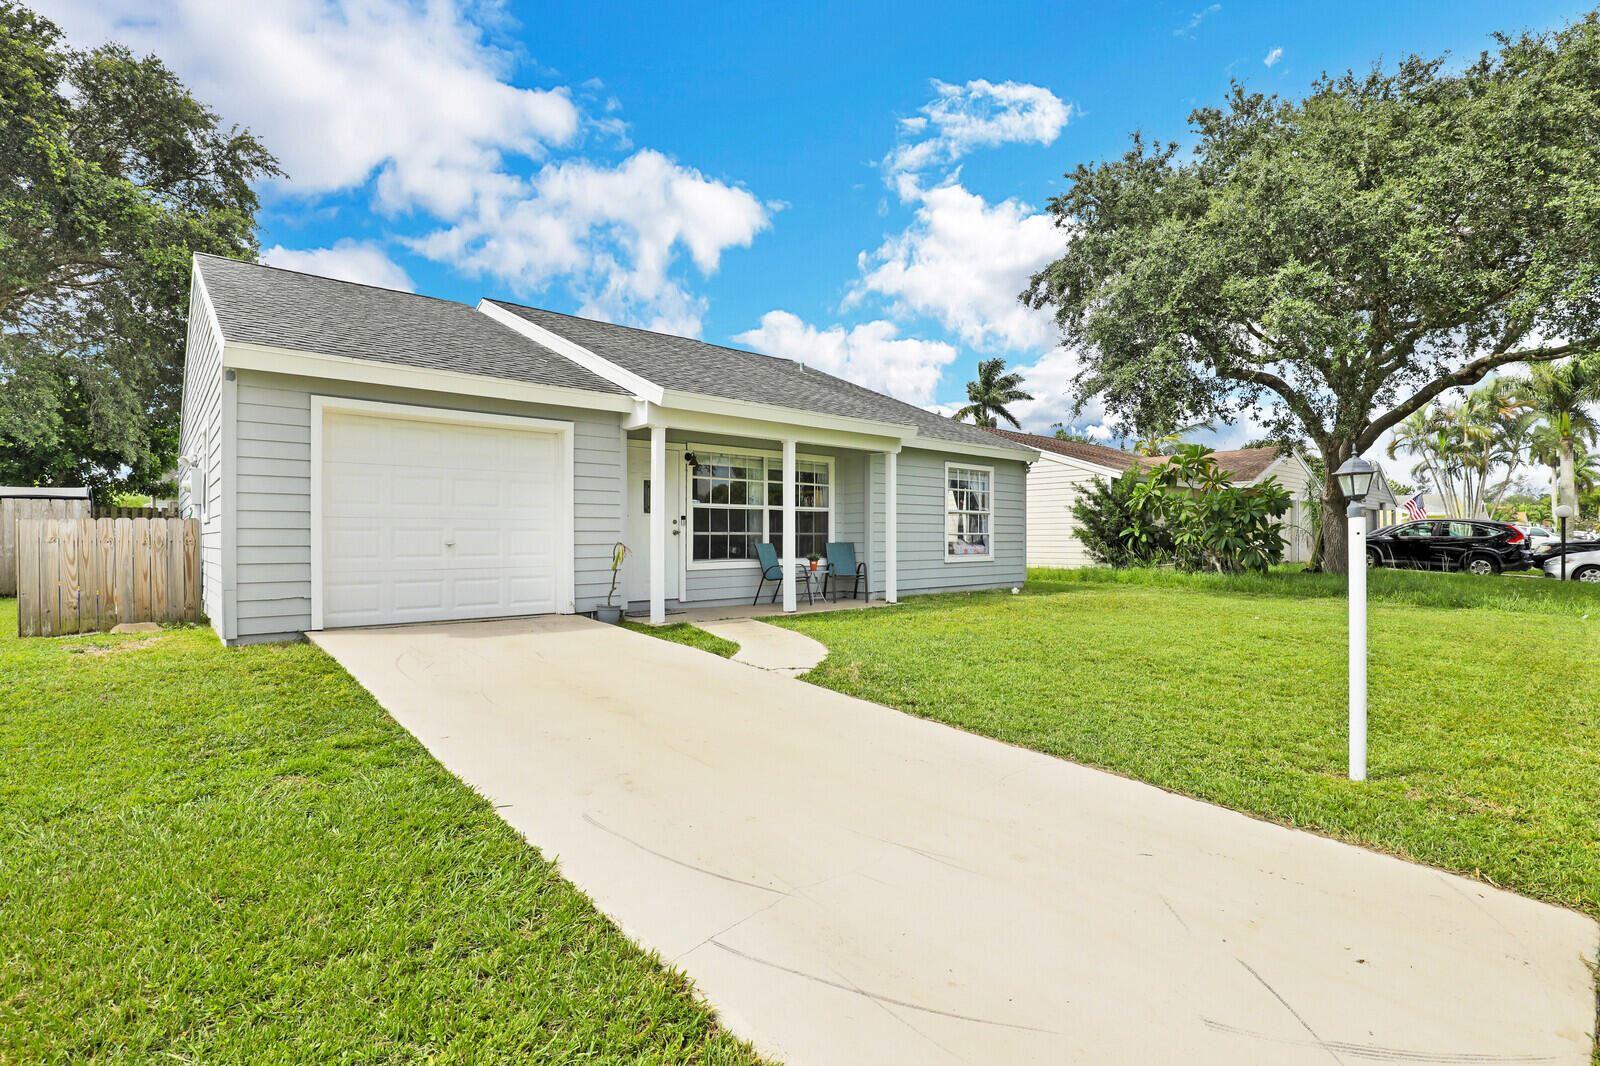 7803 Blairwood Circle N, Lake Worth, FL 33467 - MLS#: RX-10742426